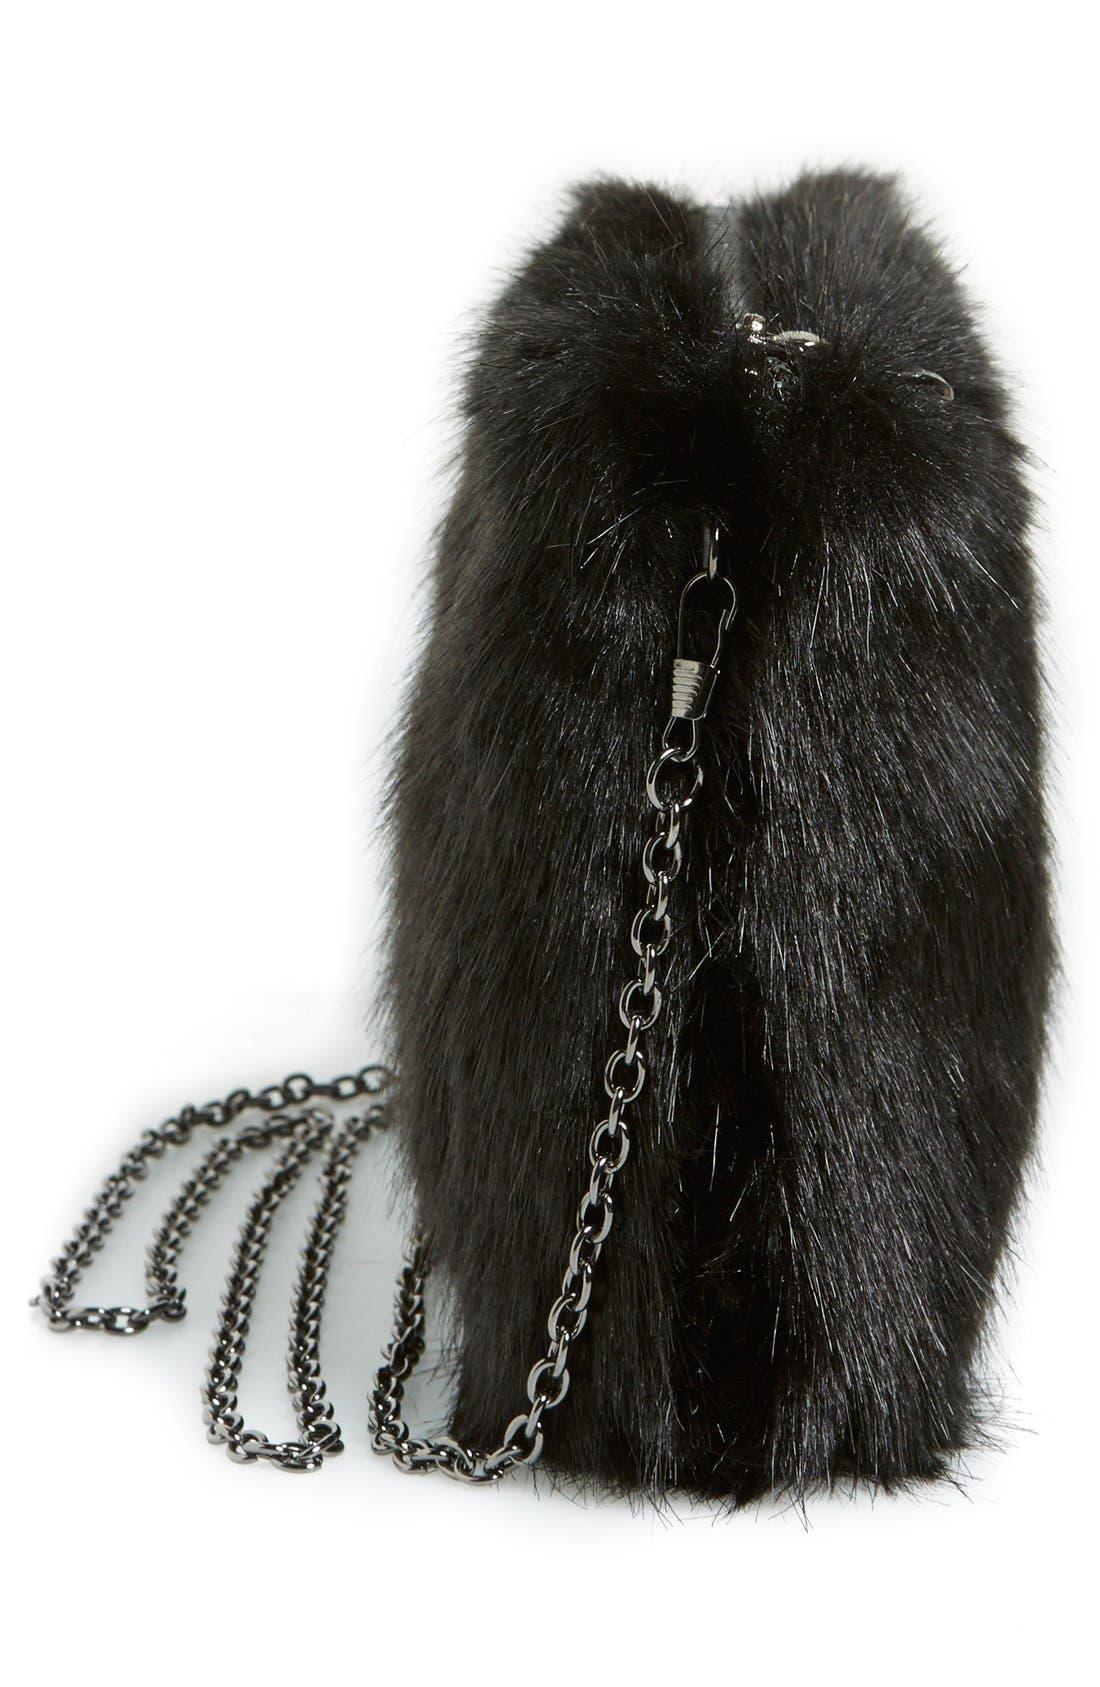 LA DOUBLE 7,                             No Brand Needed Faux Fur Convertible Clutch,                             Alternate thumbnail 4, color,                             001